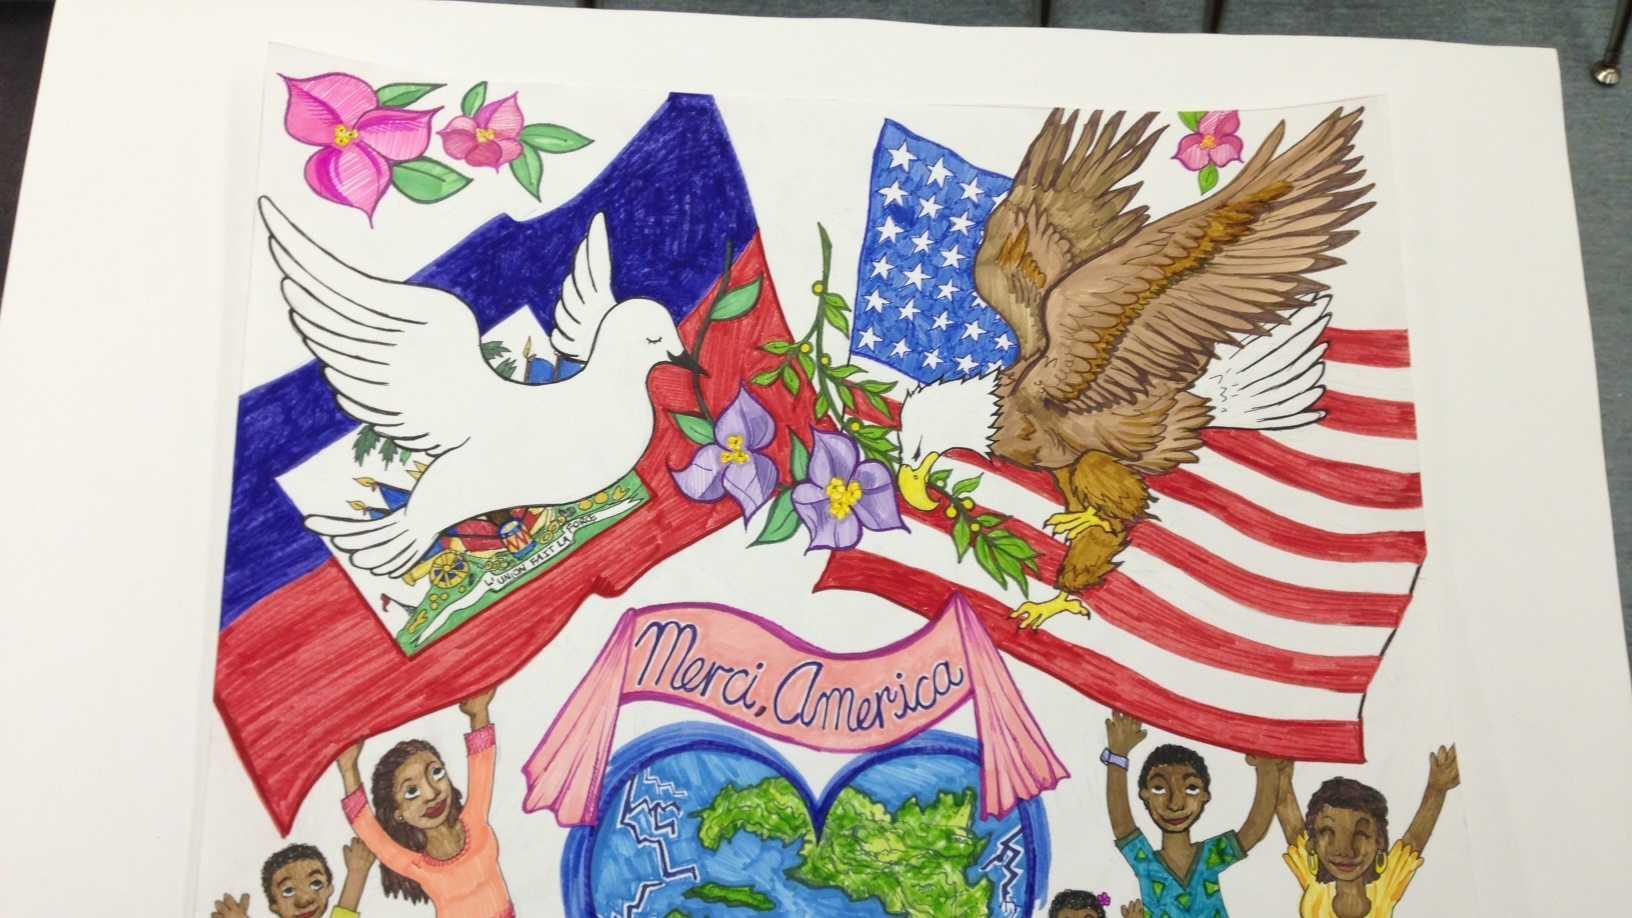 Haiti mosaic 'Merci, America'